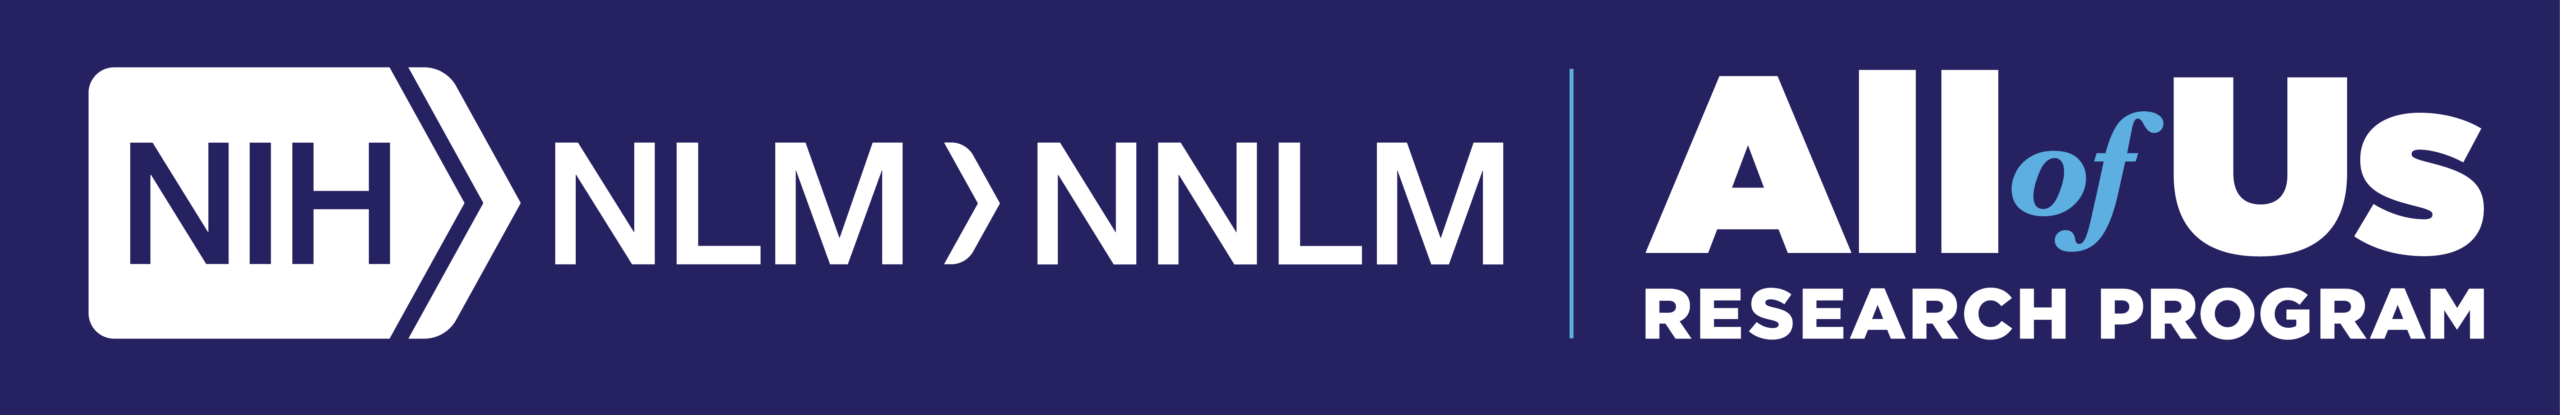 NNLM_AoU_Long_Blue_Background_CoBrand_Logo_190711